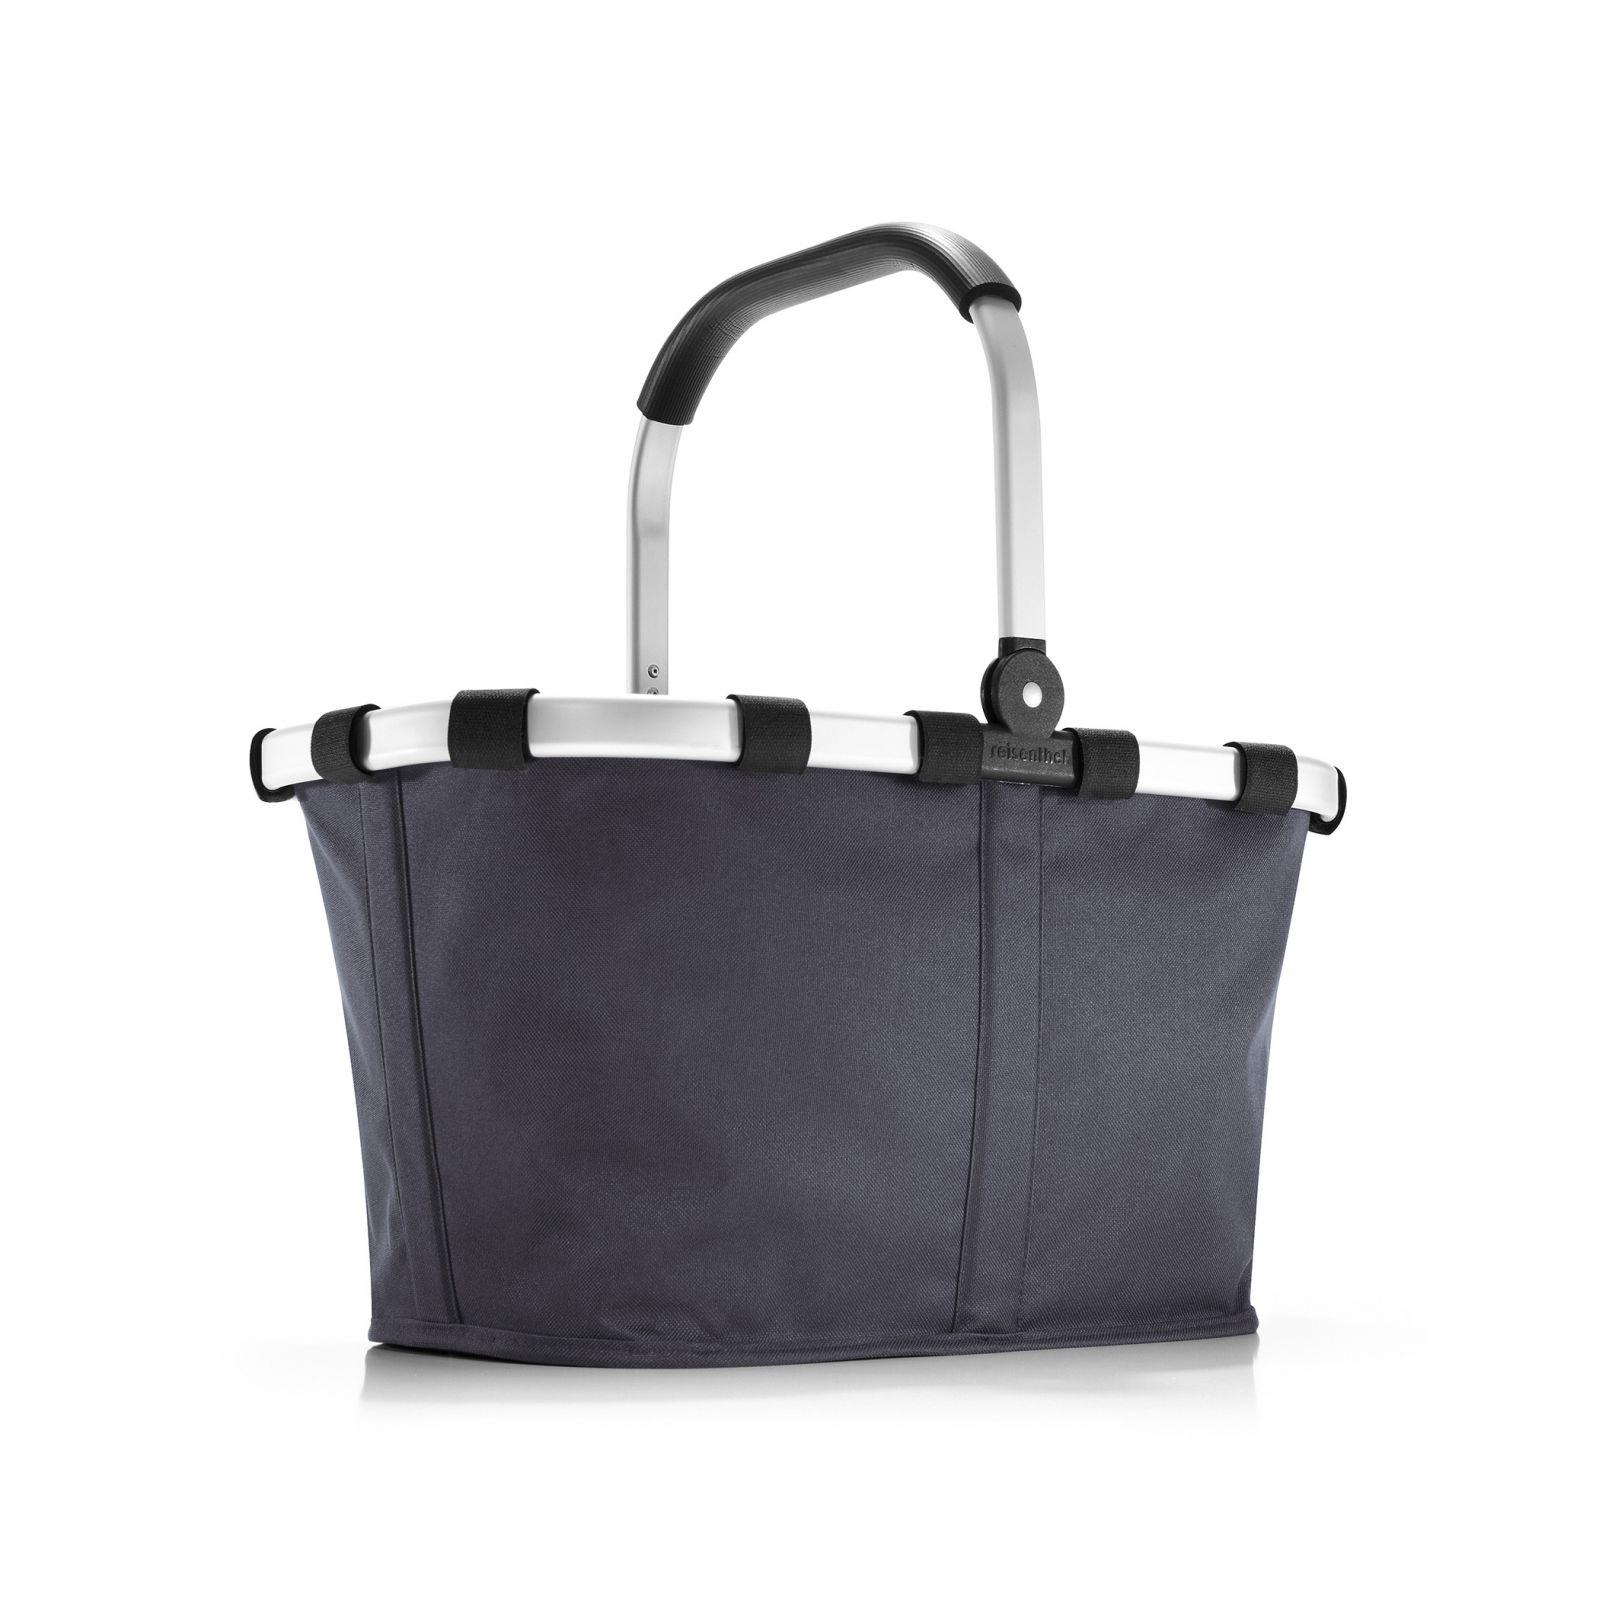 Reisenthel CarryBag Graphite E-batoh